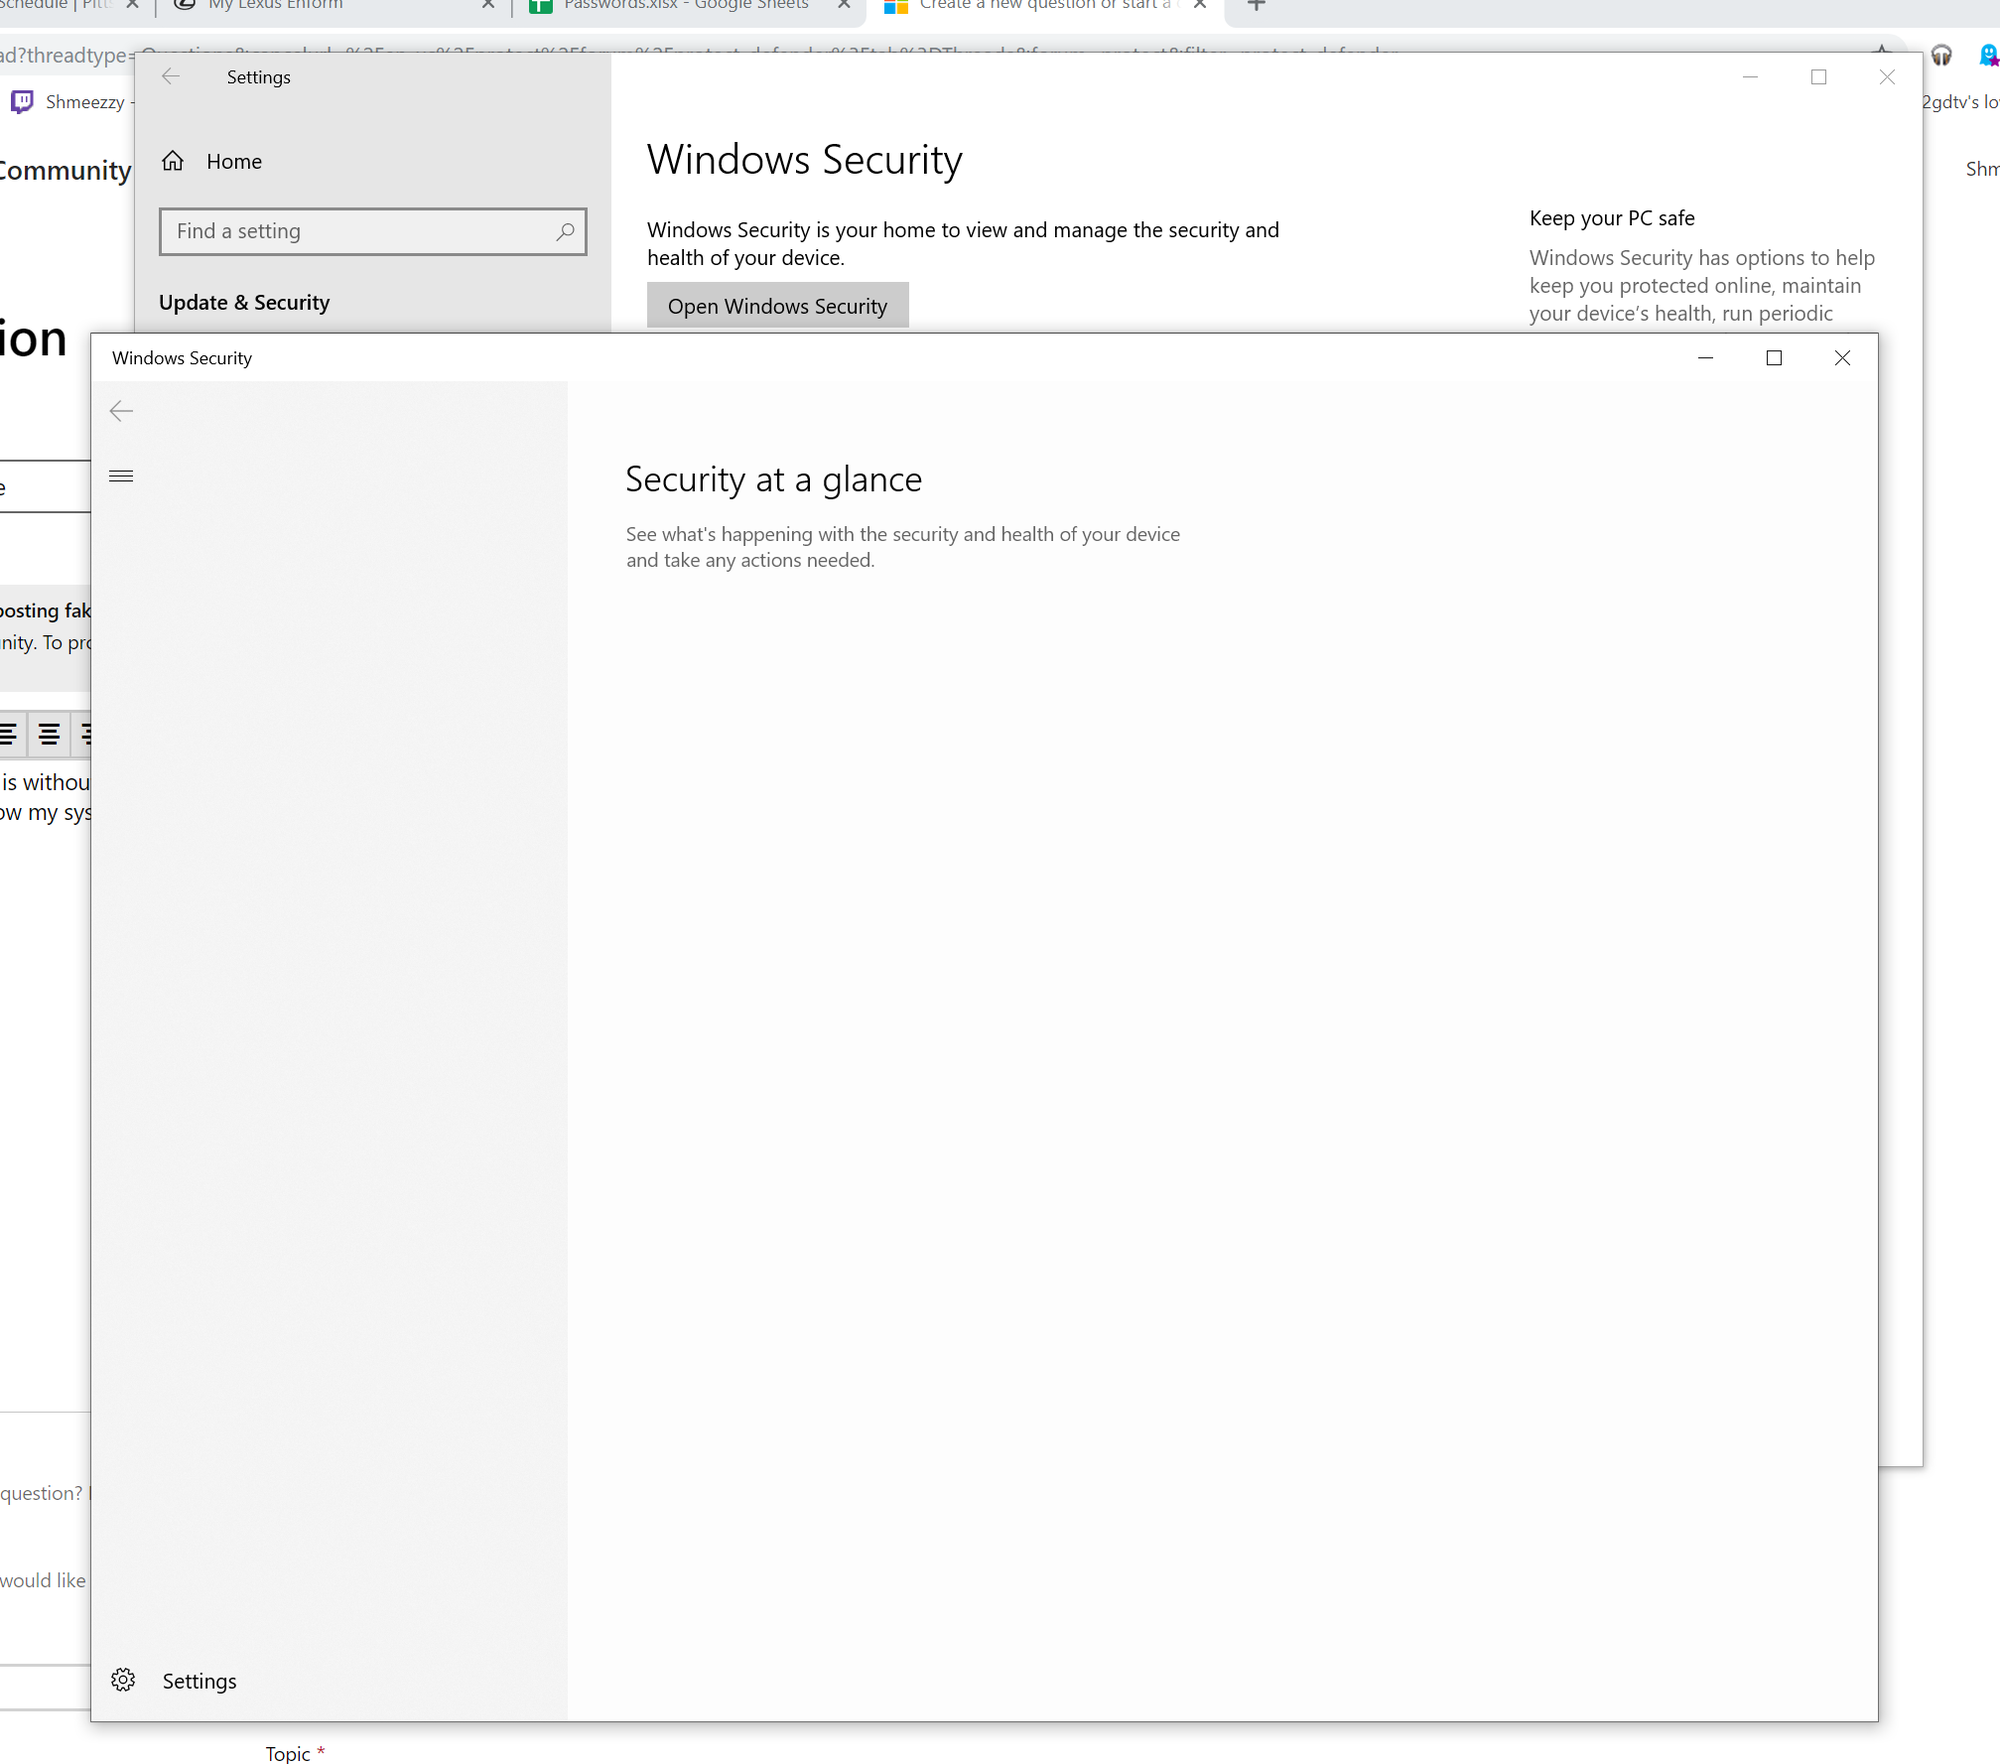 Windows Defender is gone 4726dd69-e45b-440b-af09-e7f2197e653d?upload=true.png